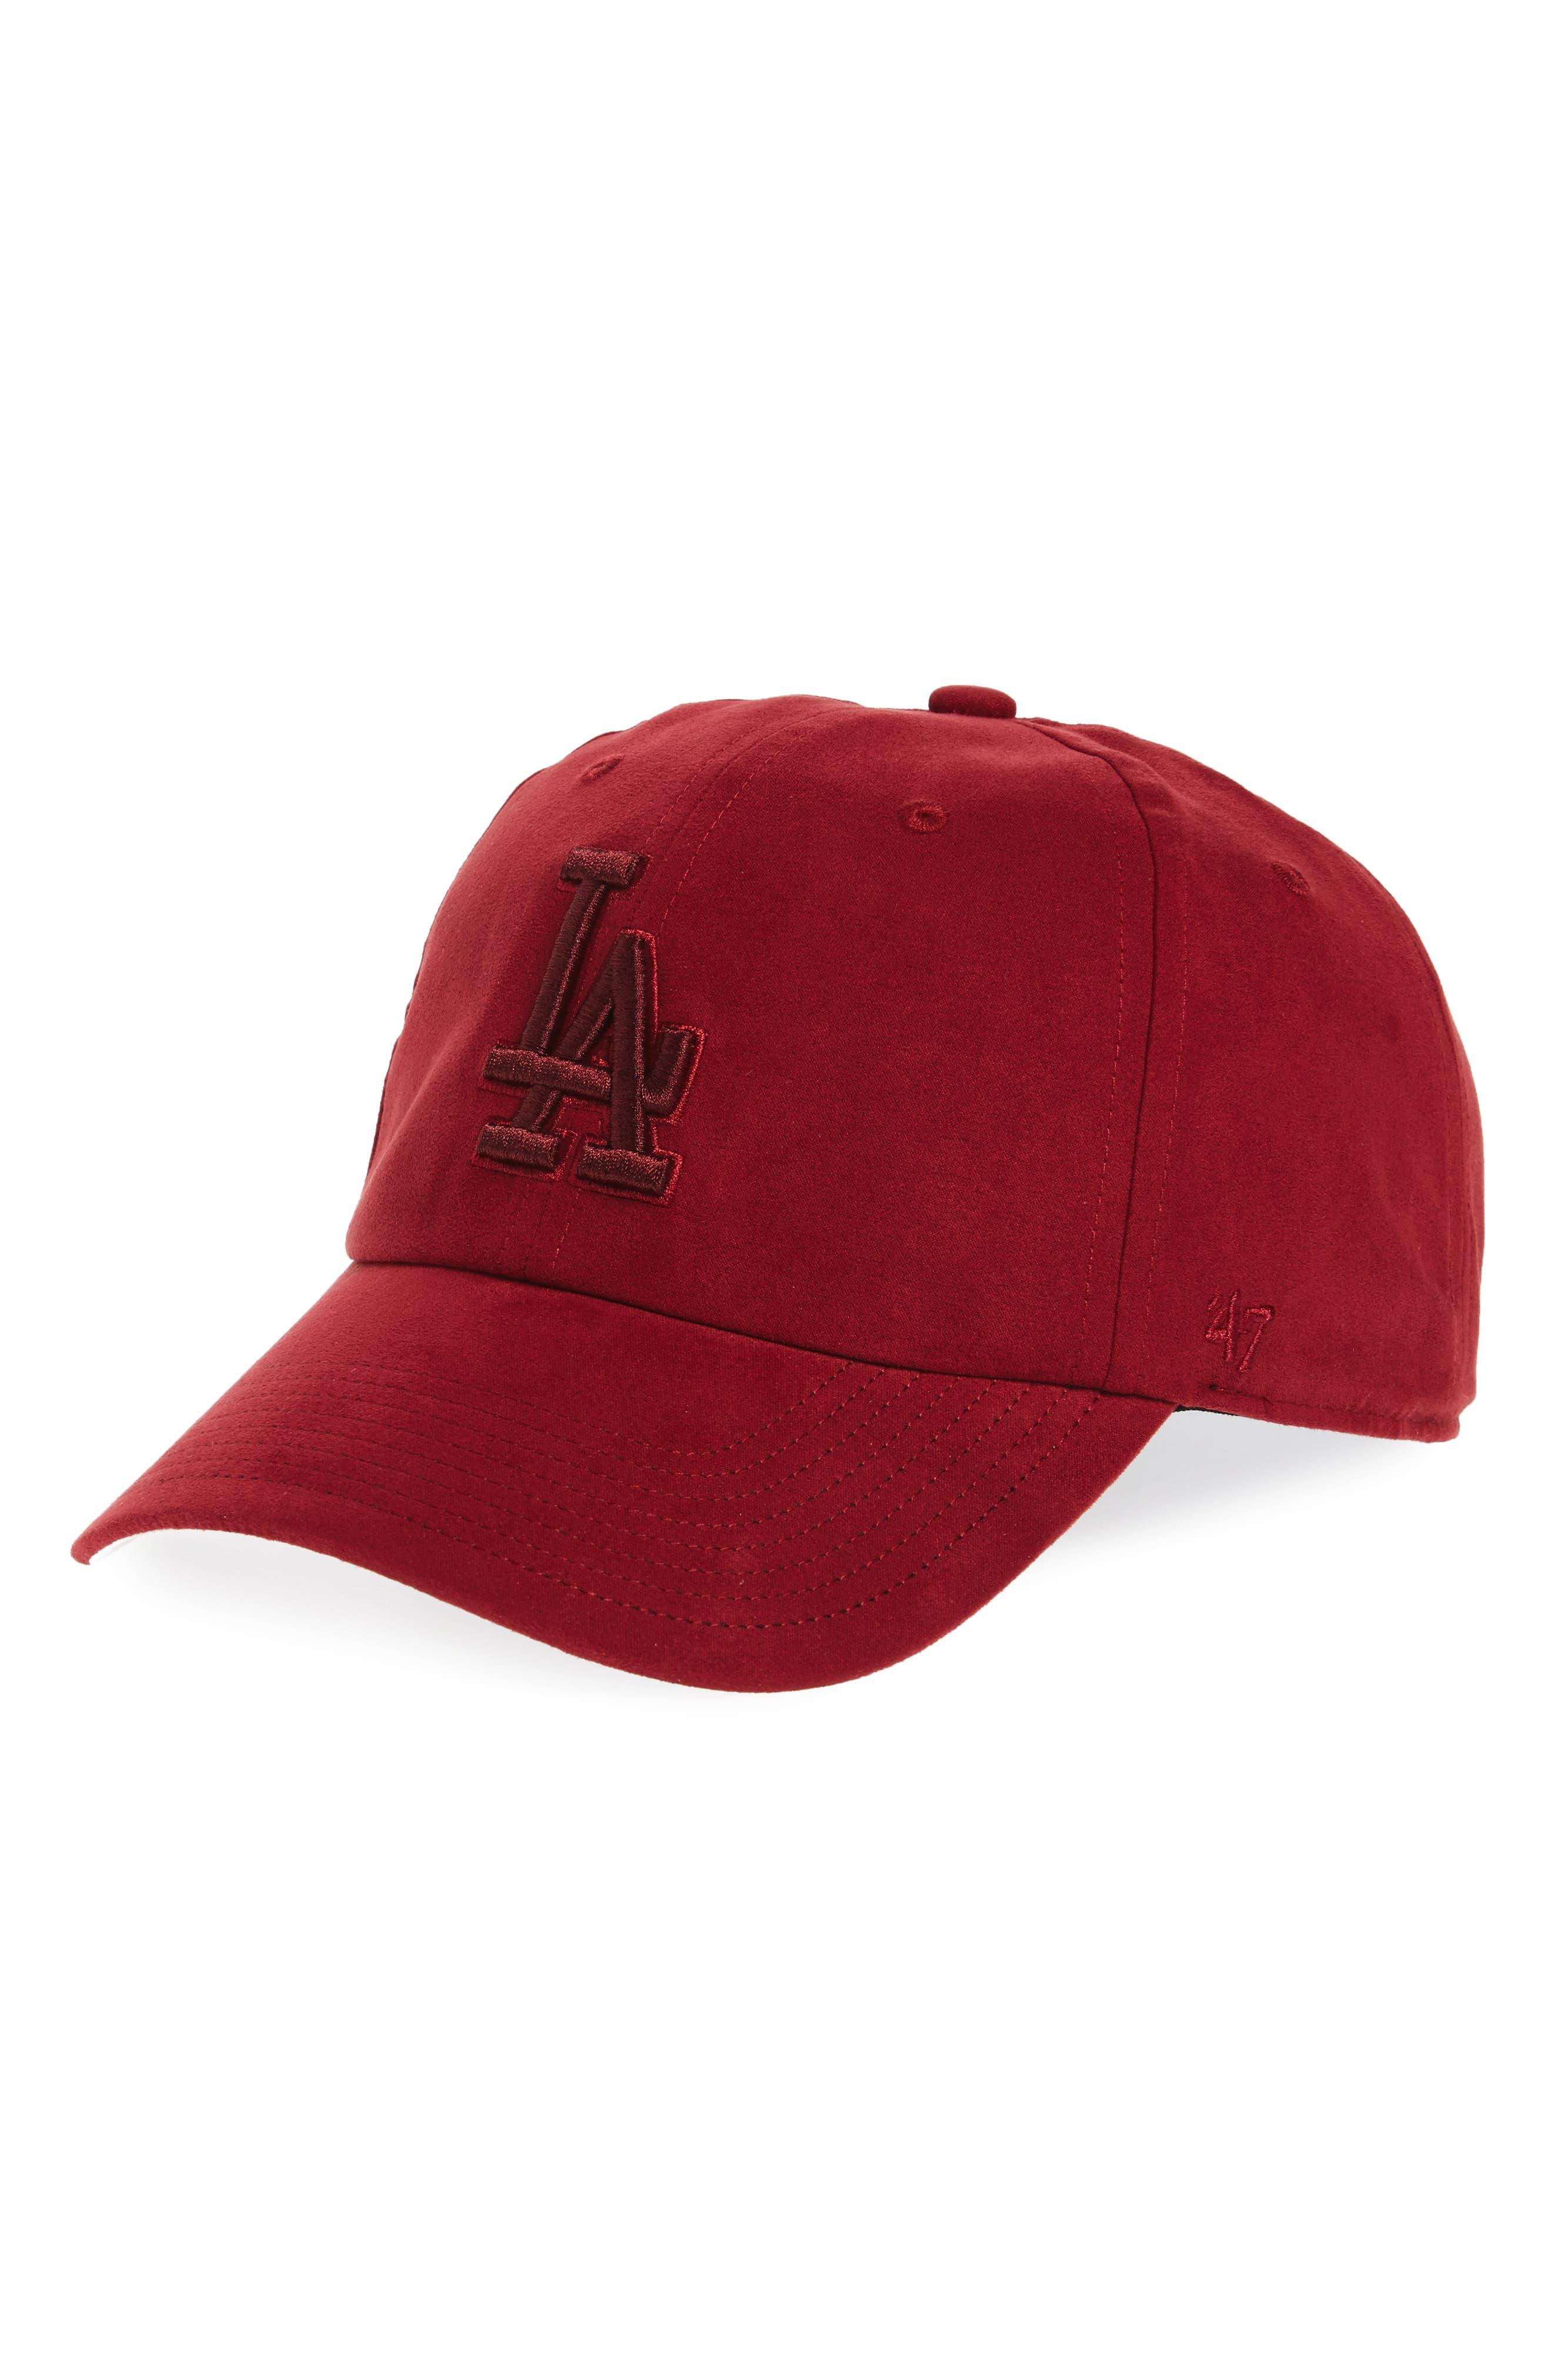 Main Image - '47 Brand Los Angeles Dodgers Baseball Cap